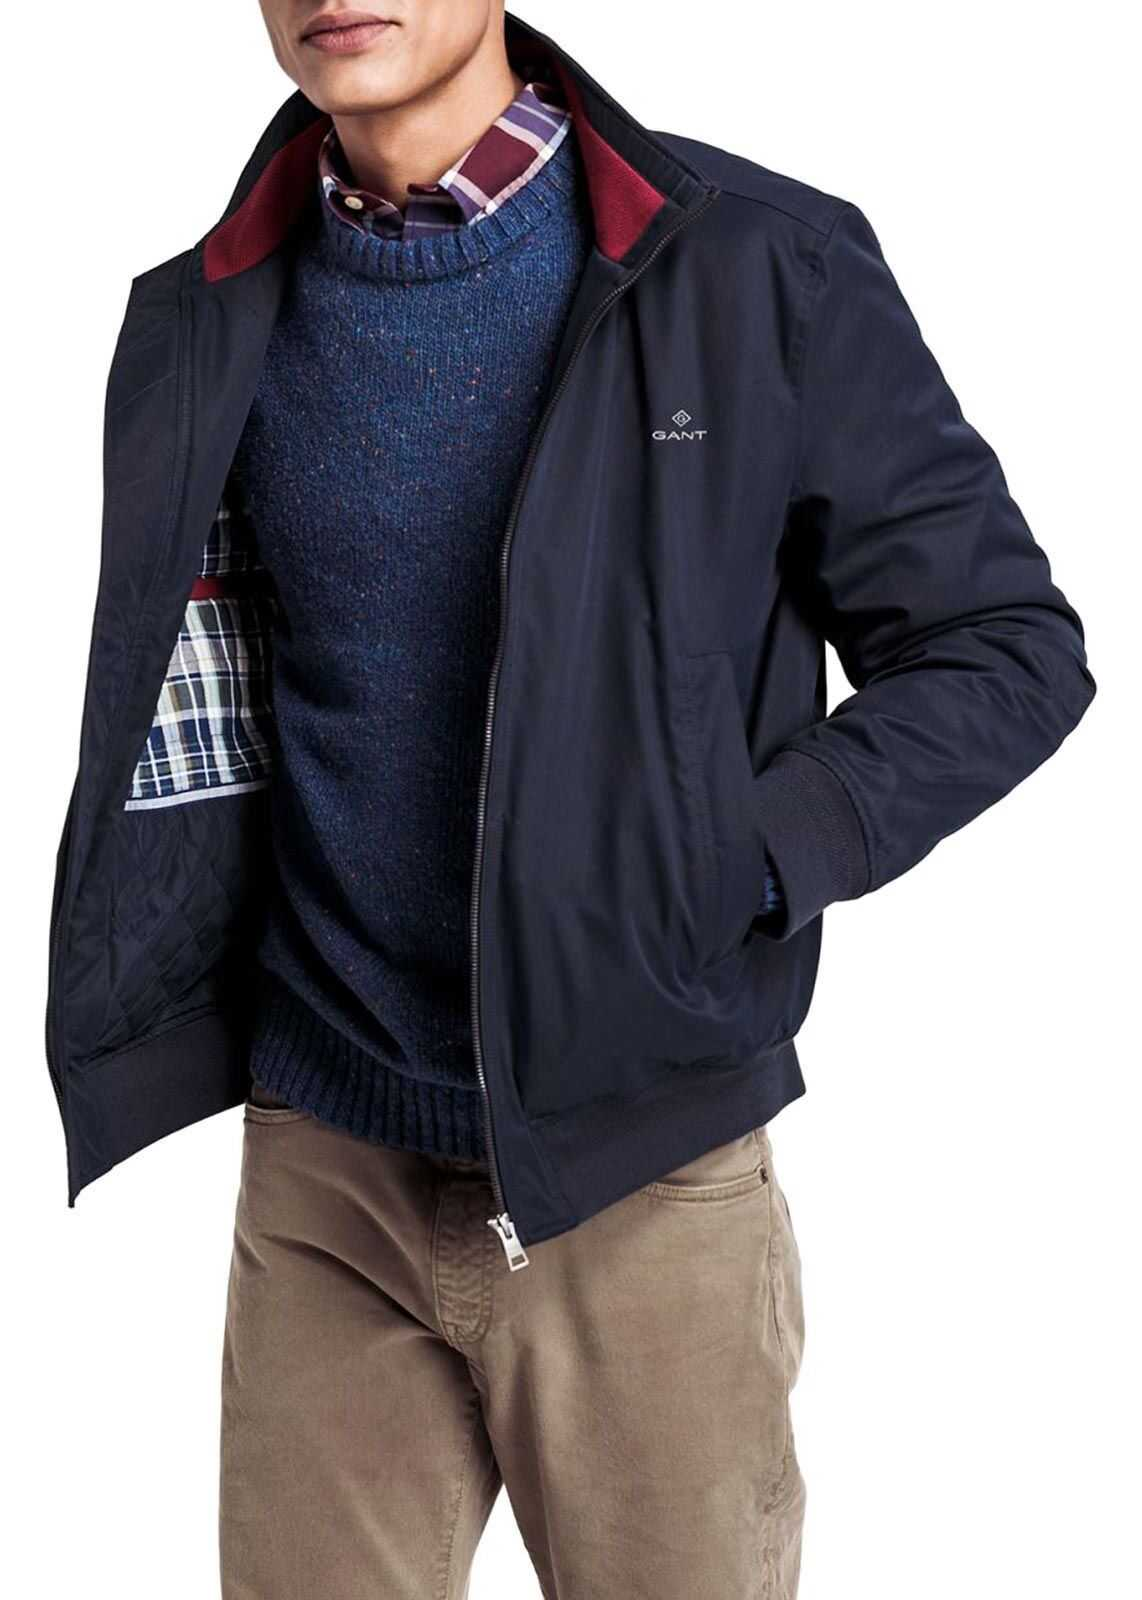 GANT Polyester Outerwear Jacket BLUE